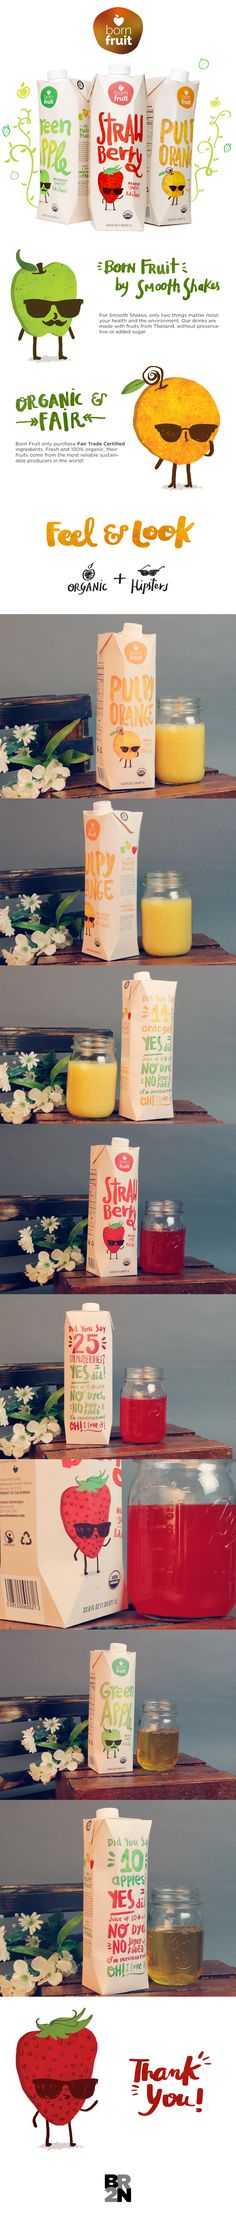 Born Fruit Juices - Packaging Design